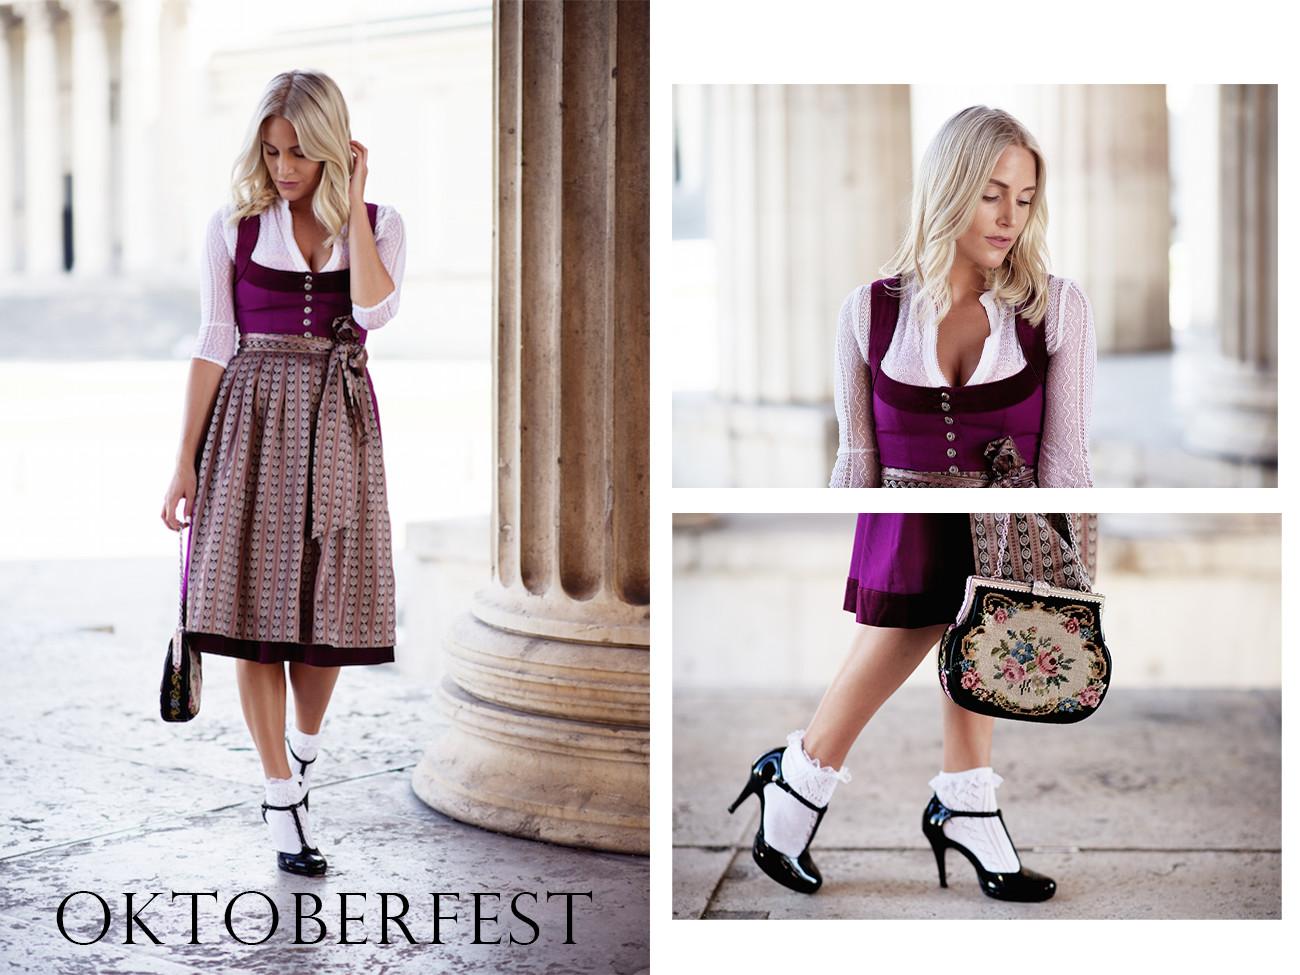 oktoberfest-dirndl-sequinsophia-cocovero-fashionblogger-munich-1-unbenannt-1